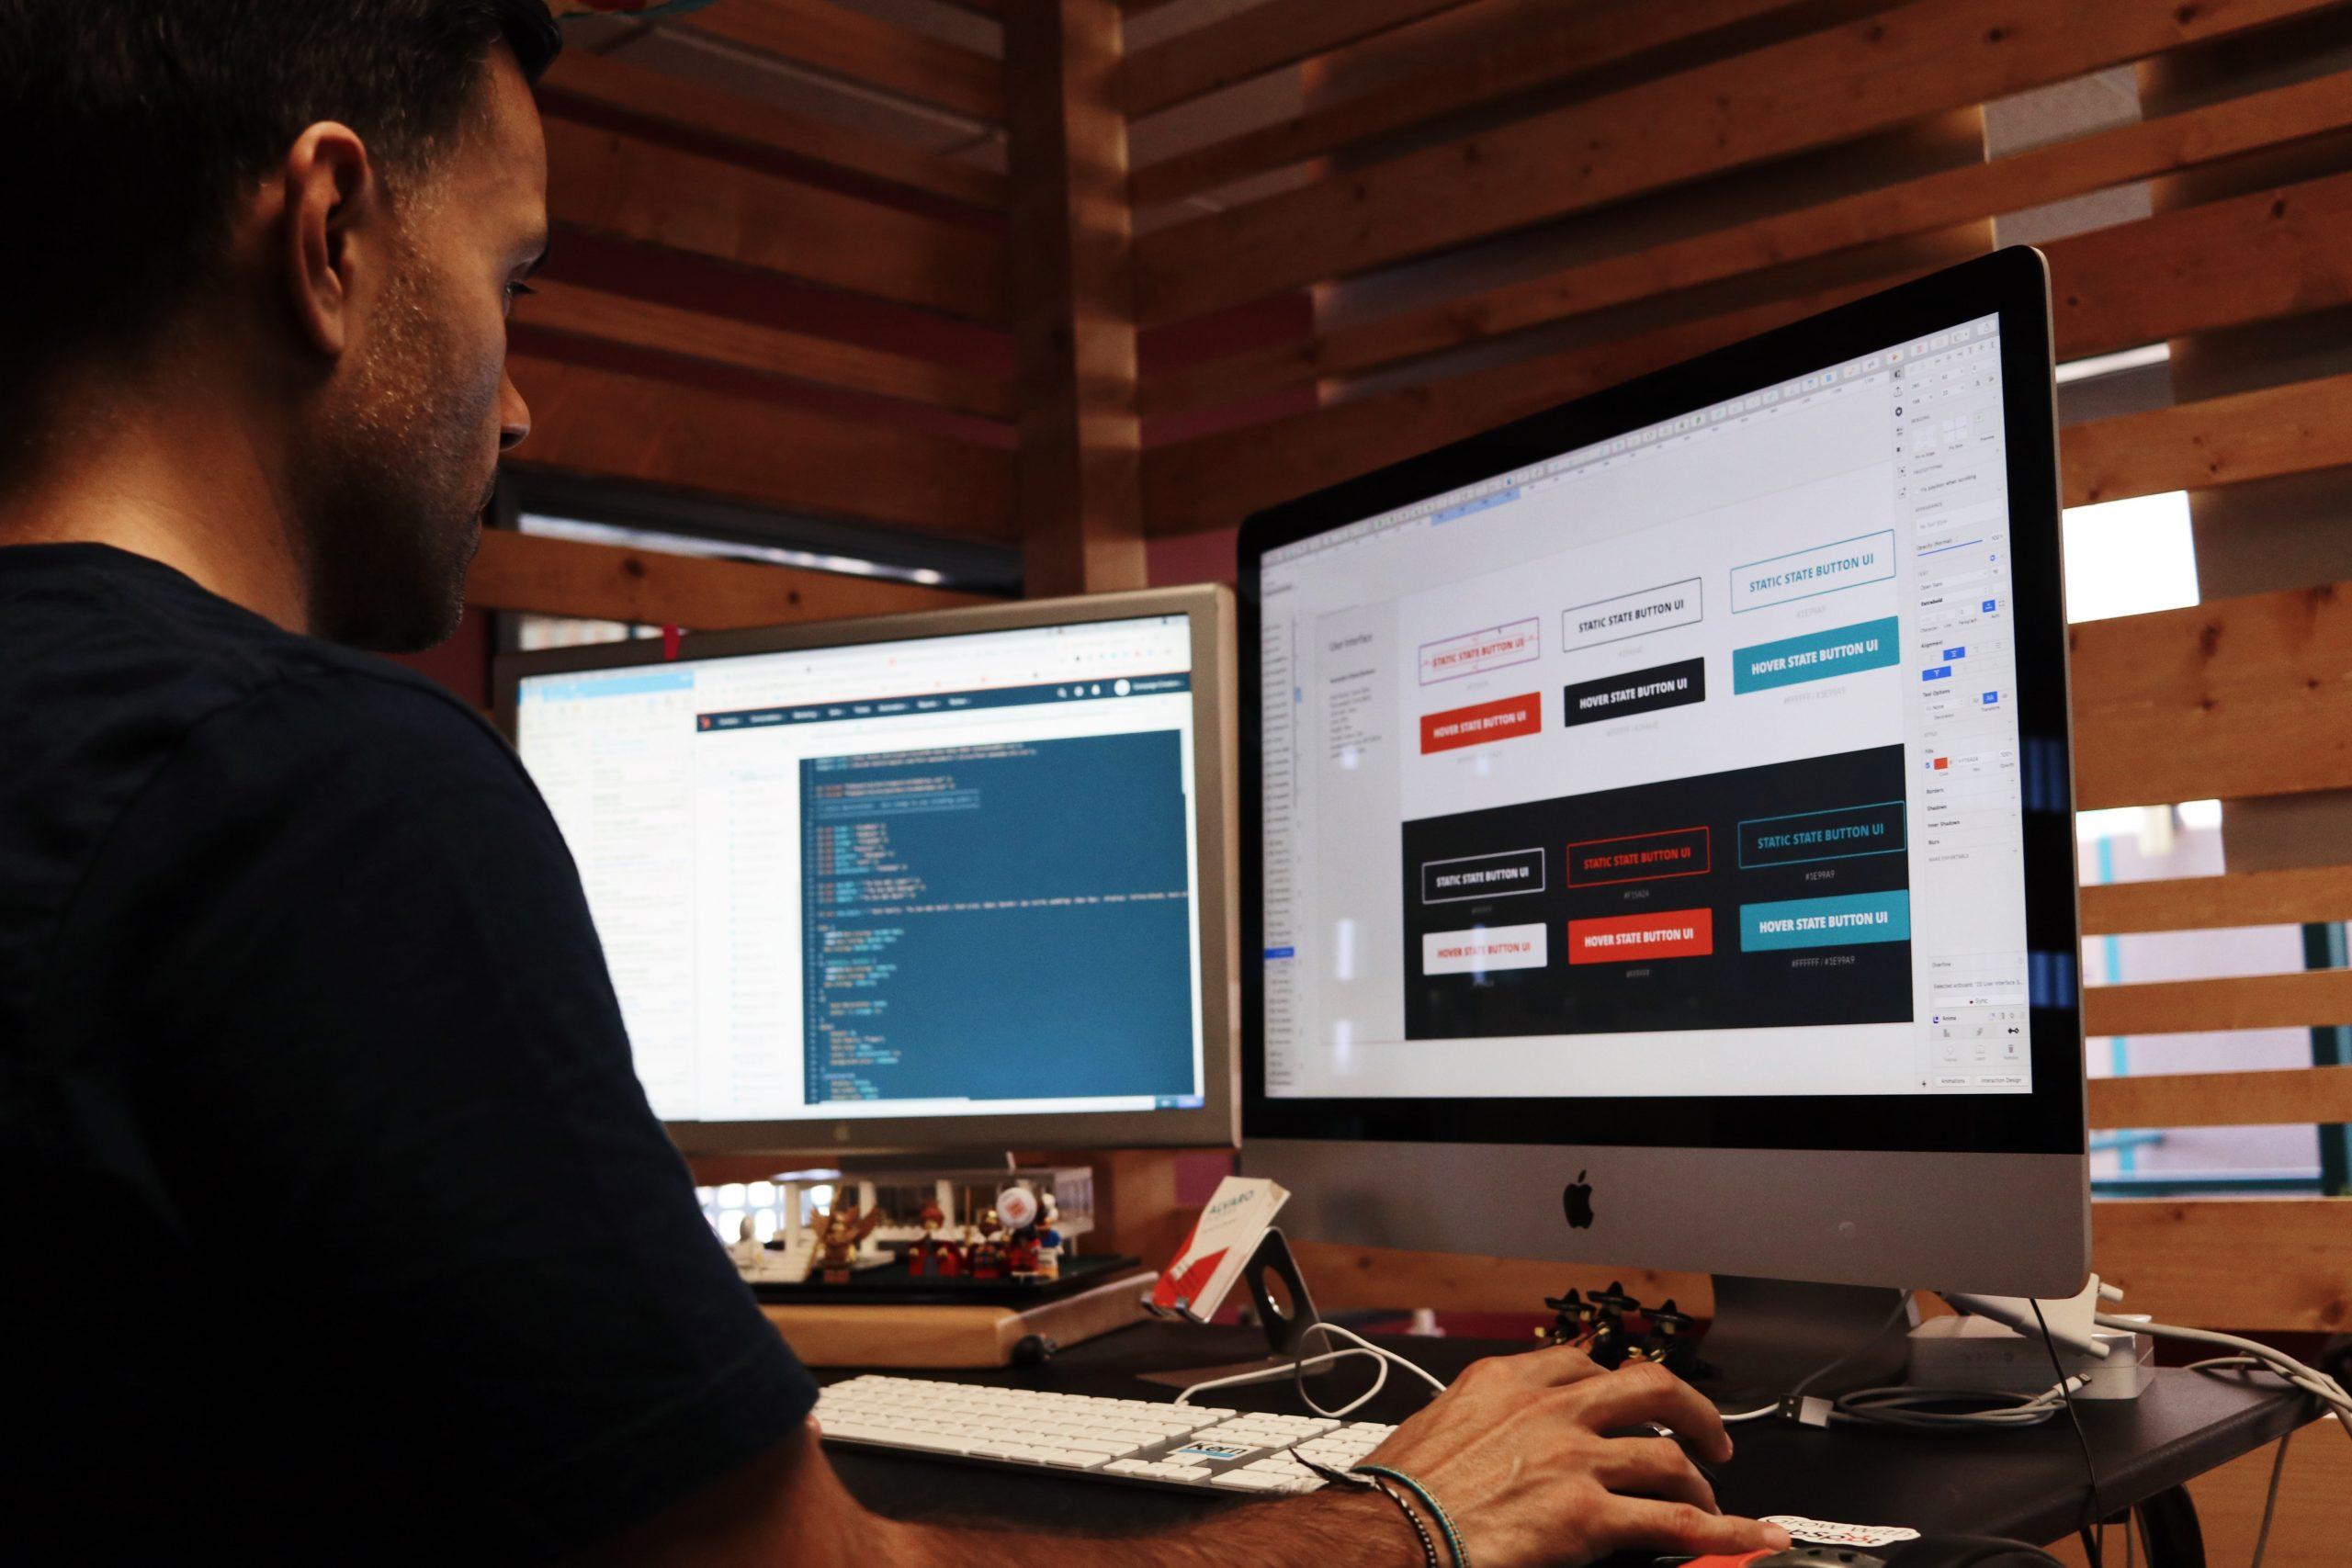 website designer working